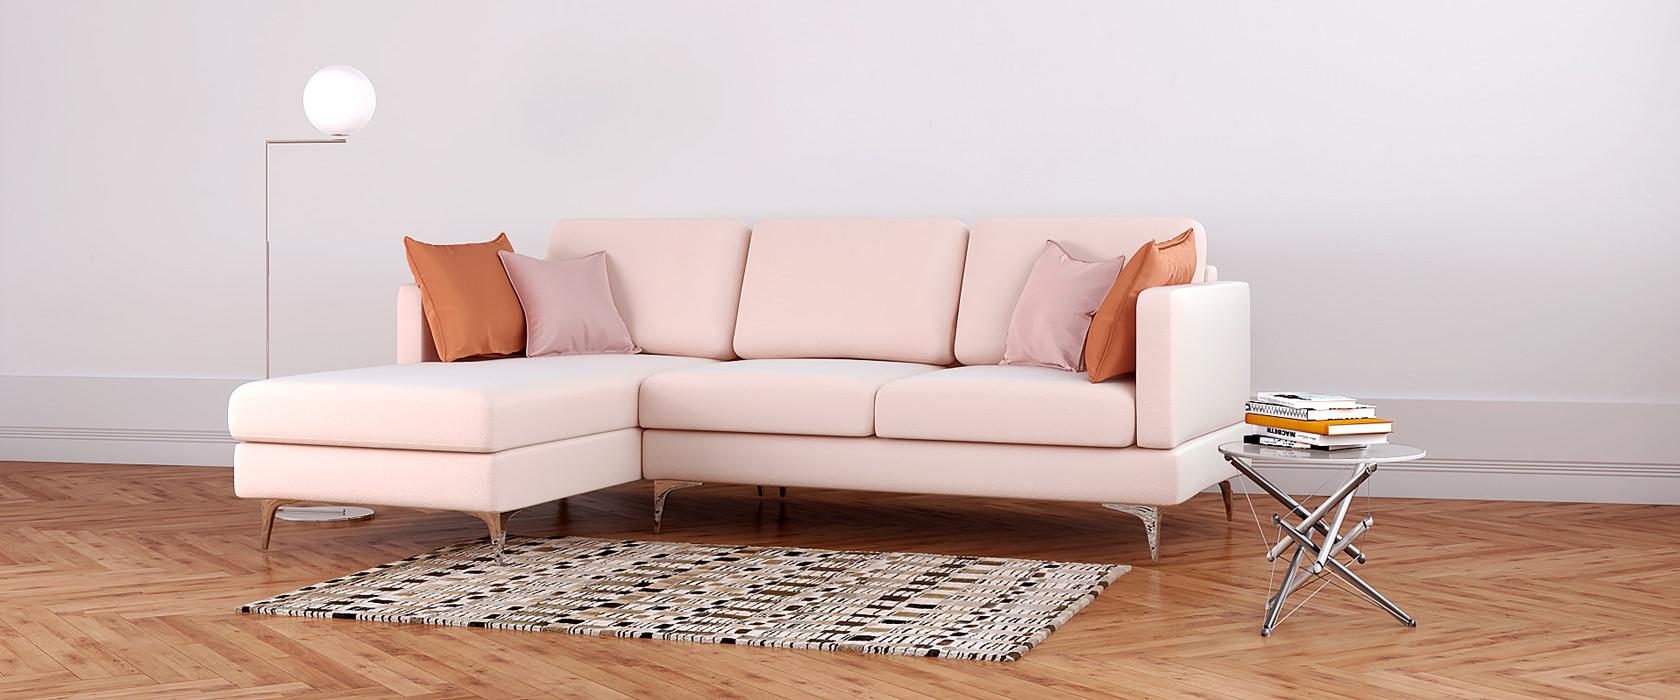 Кутовий диван Bruno Club - Фото 2 - Pufetto